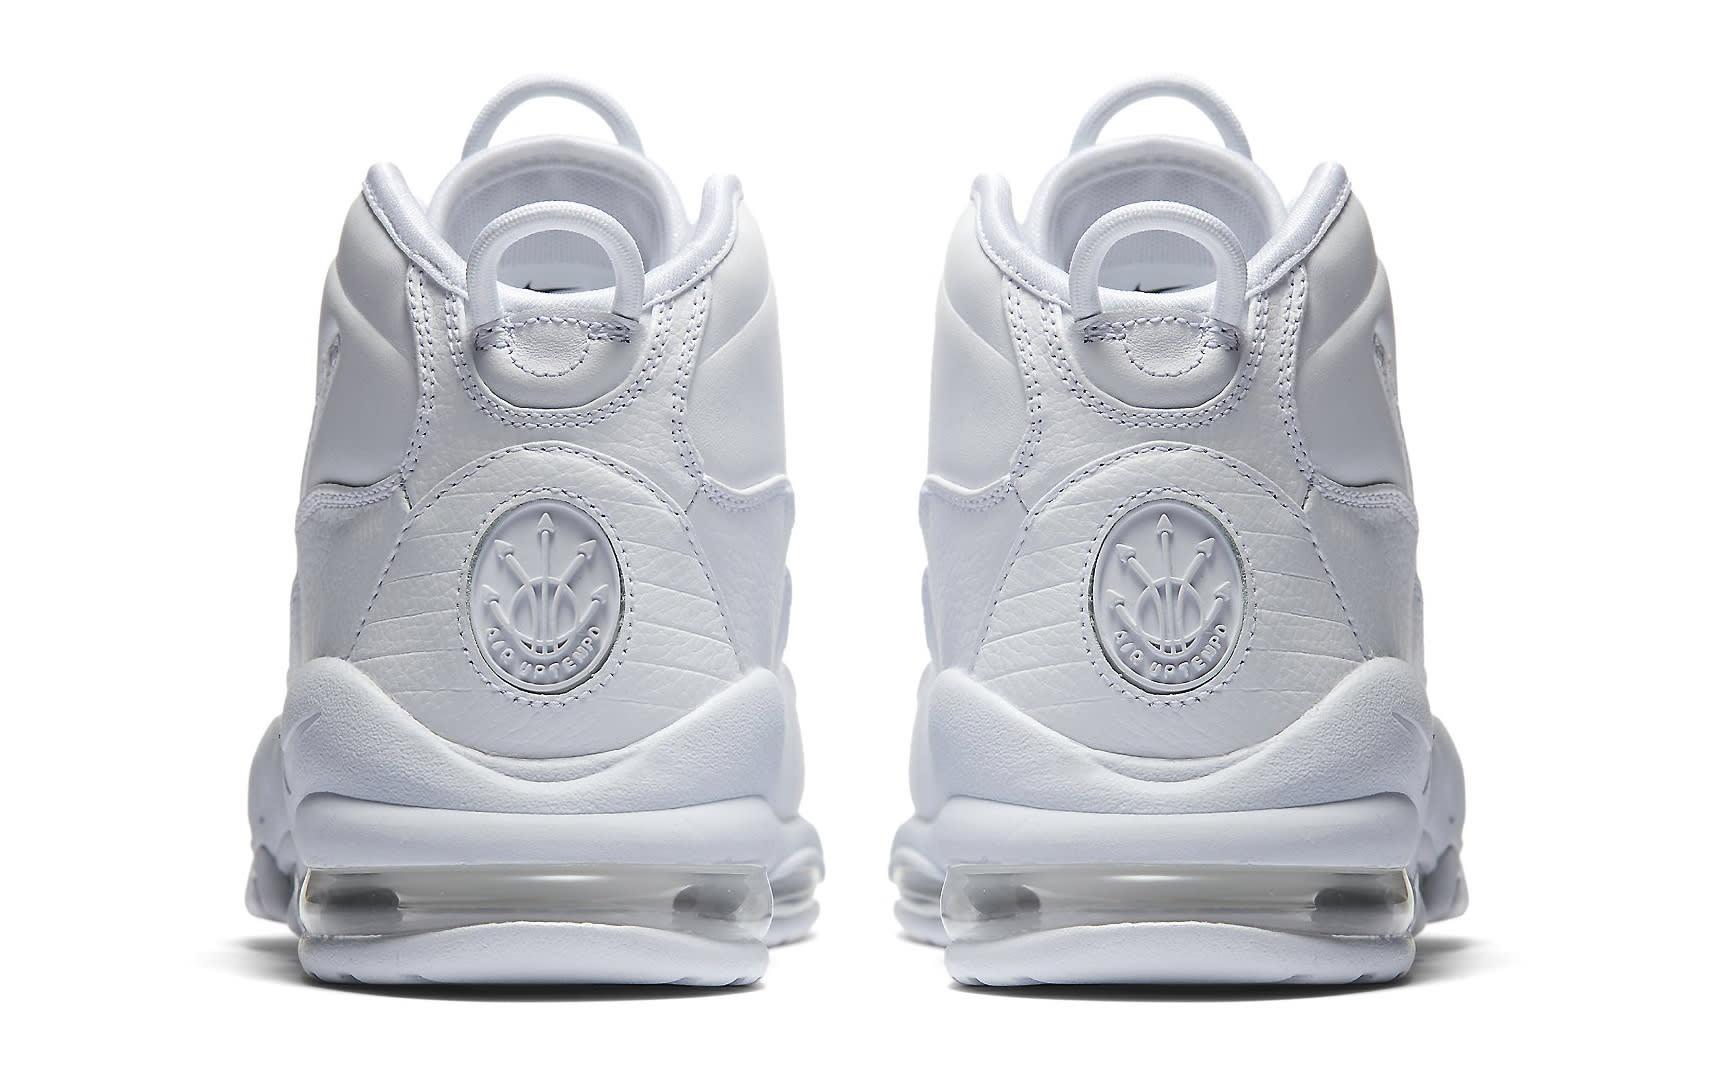 Triple White Nike Air Max Uptempo 922935-100 Heel